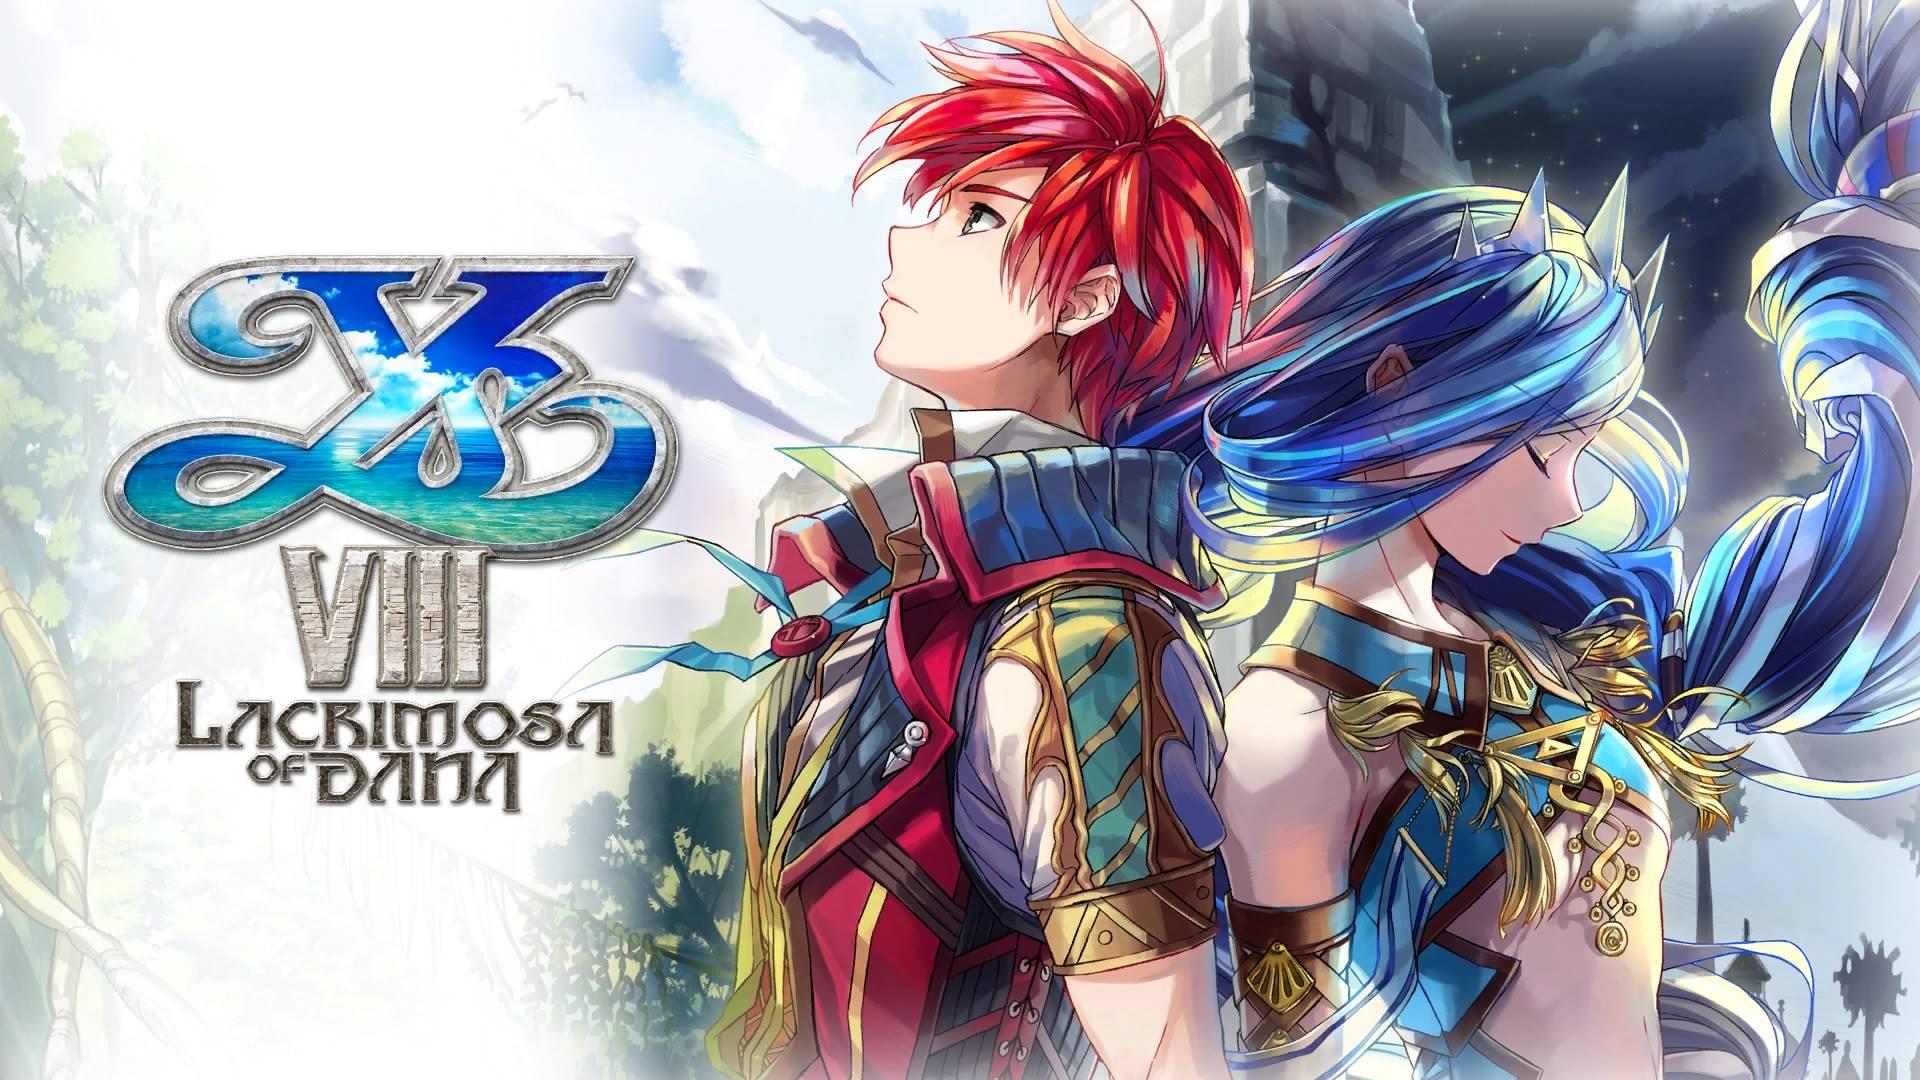 Ys VIII: Lacrimosa of Dana gameplay trailer - Nintendo